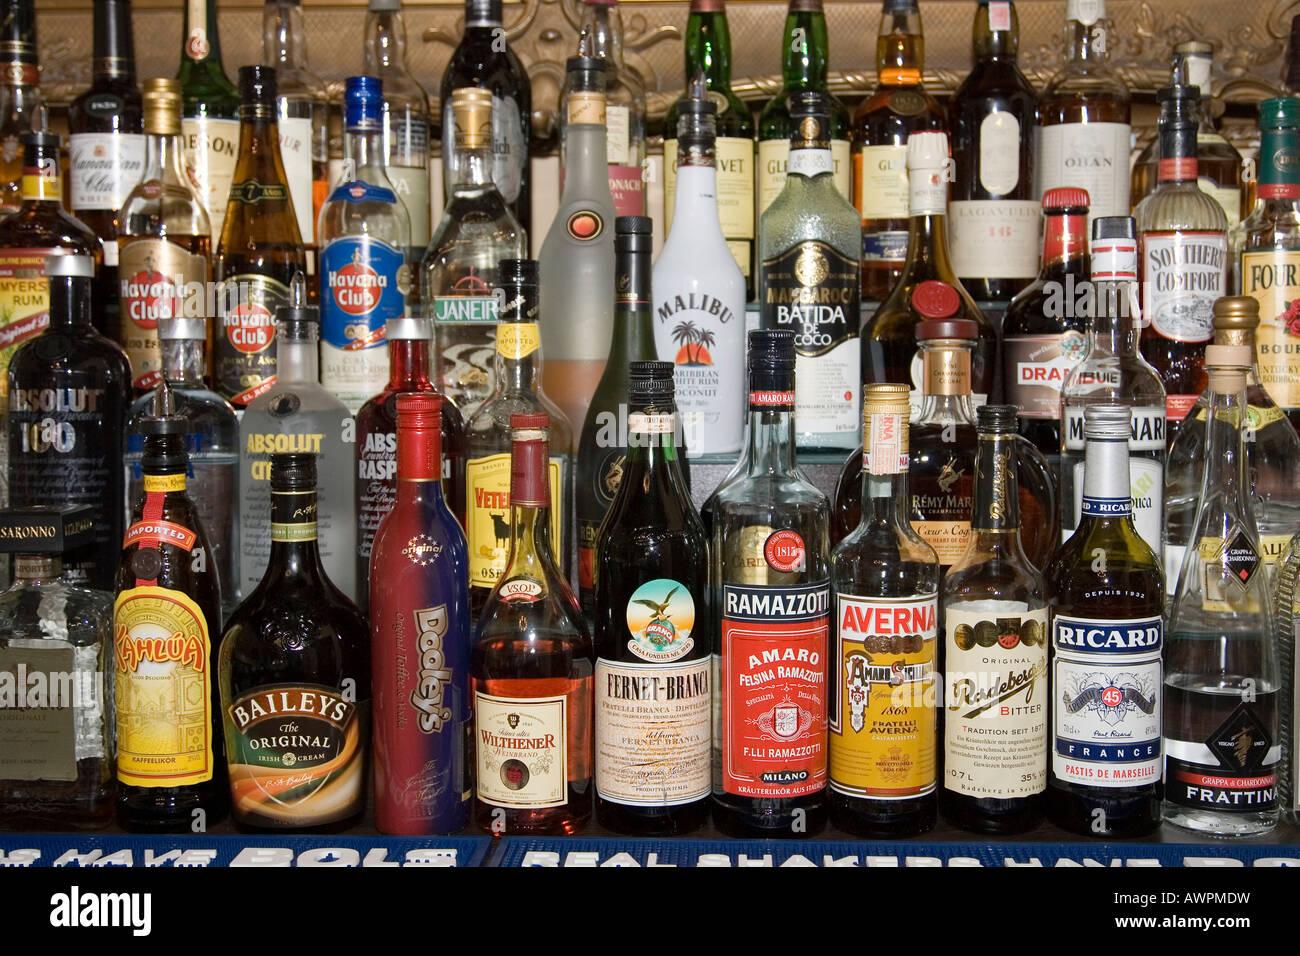 Alkoholische Getränke Stockfoto, Bild: 16633956 - Alamy